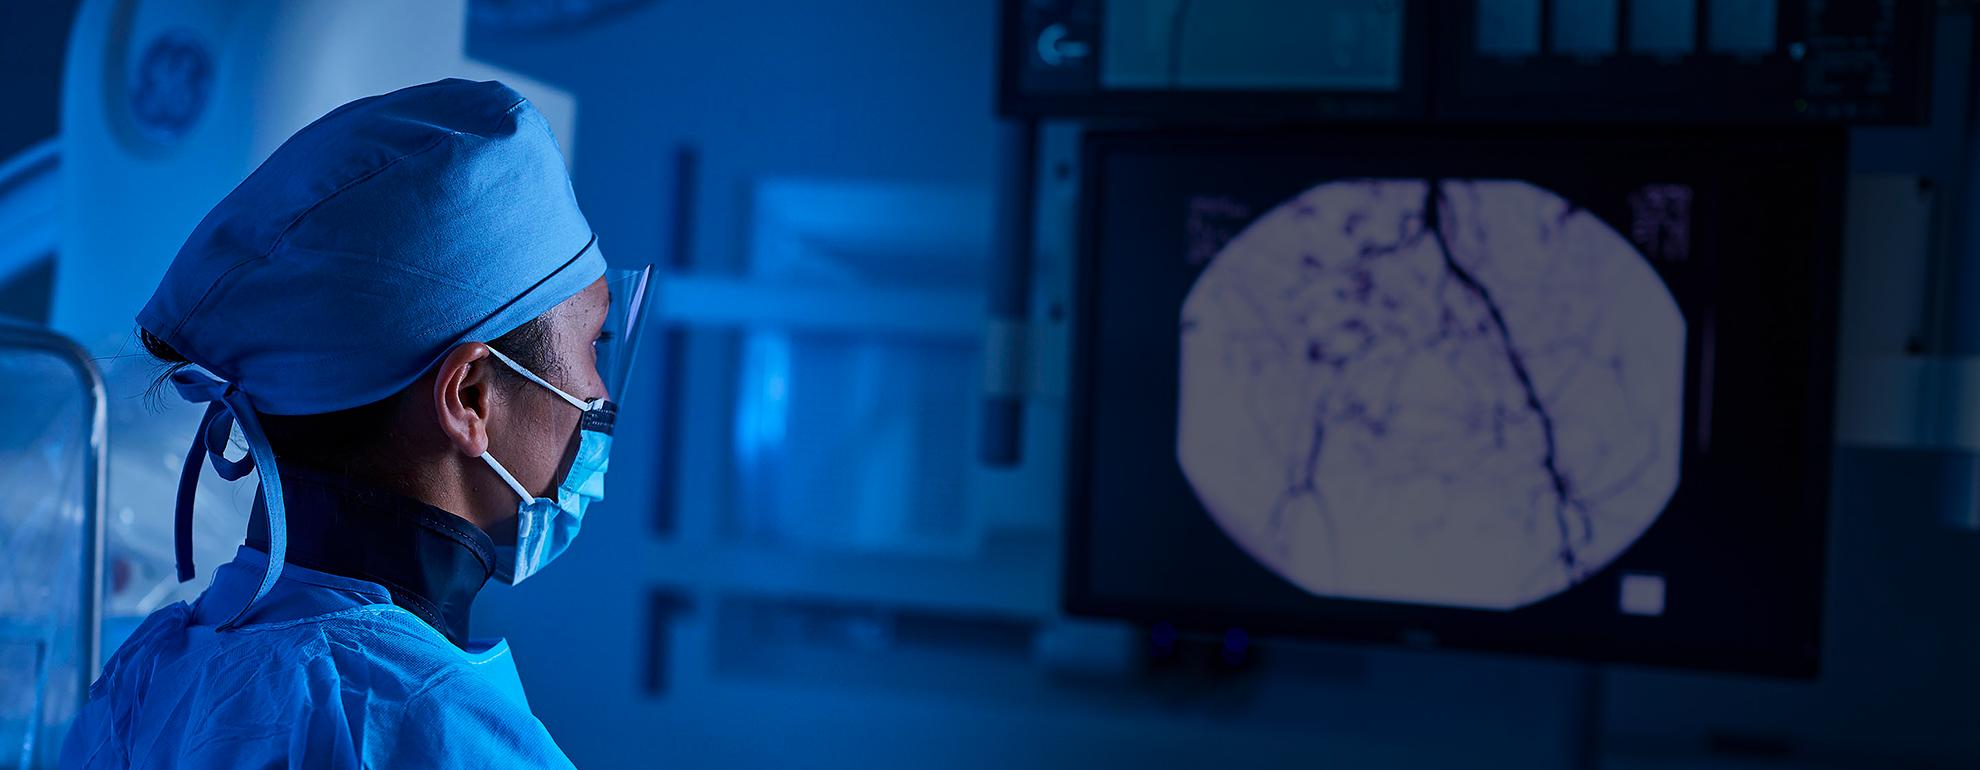 Interventional Diagnostic Radiology